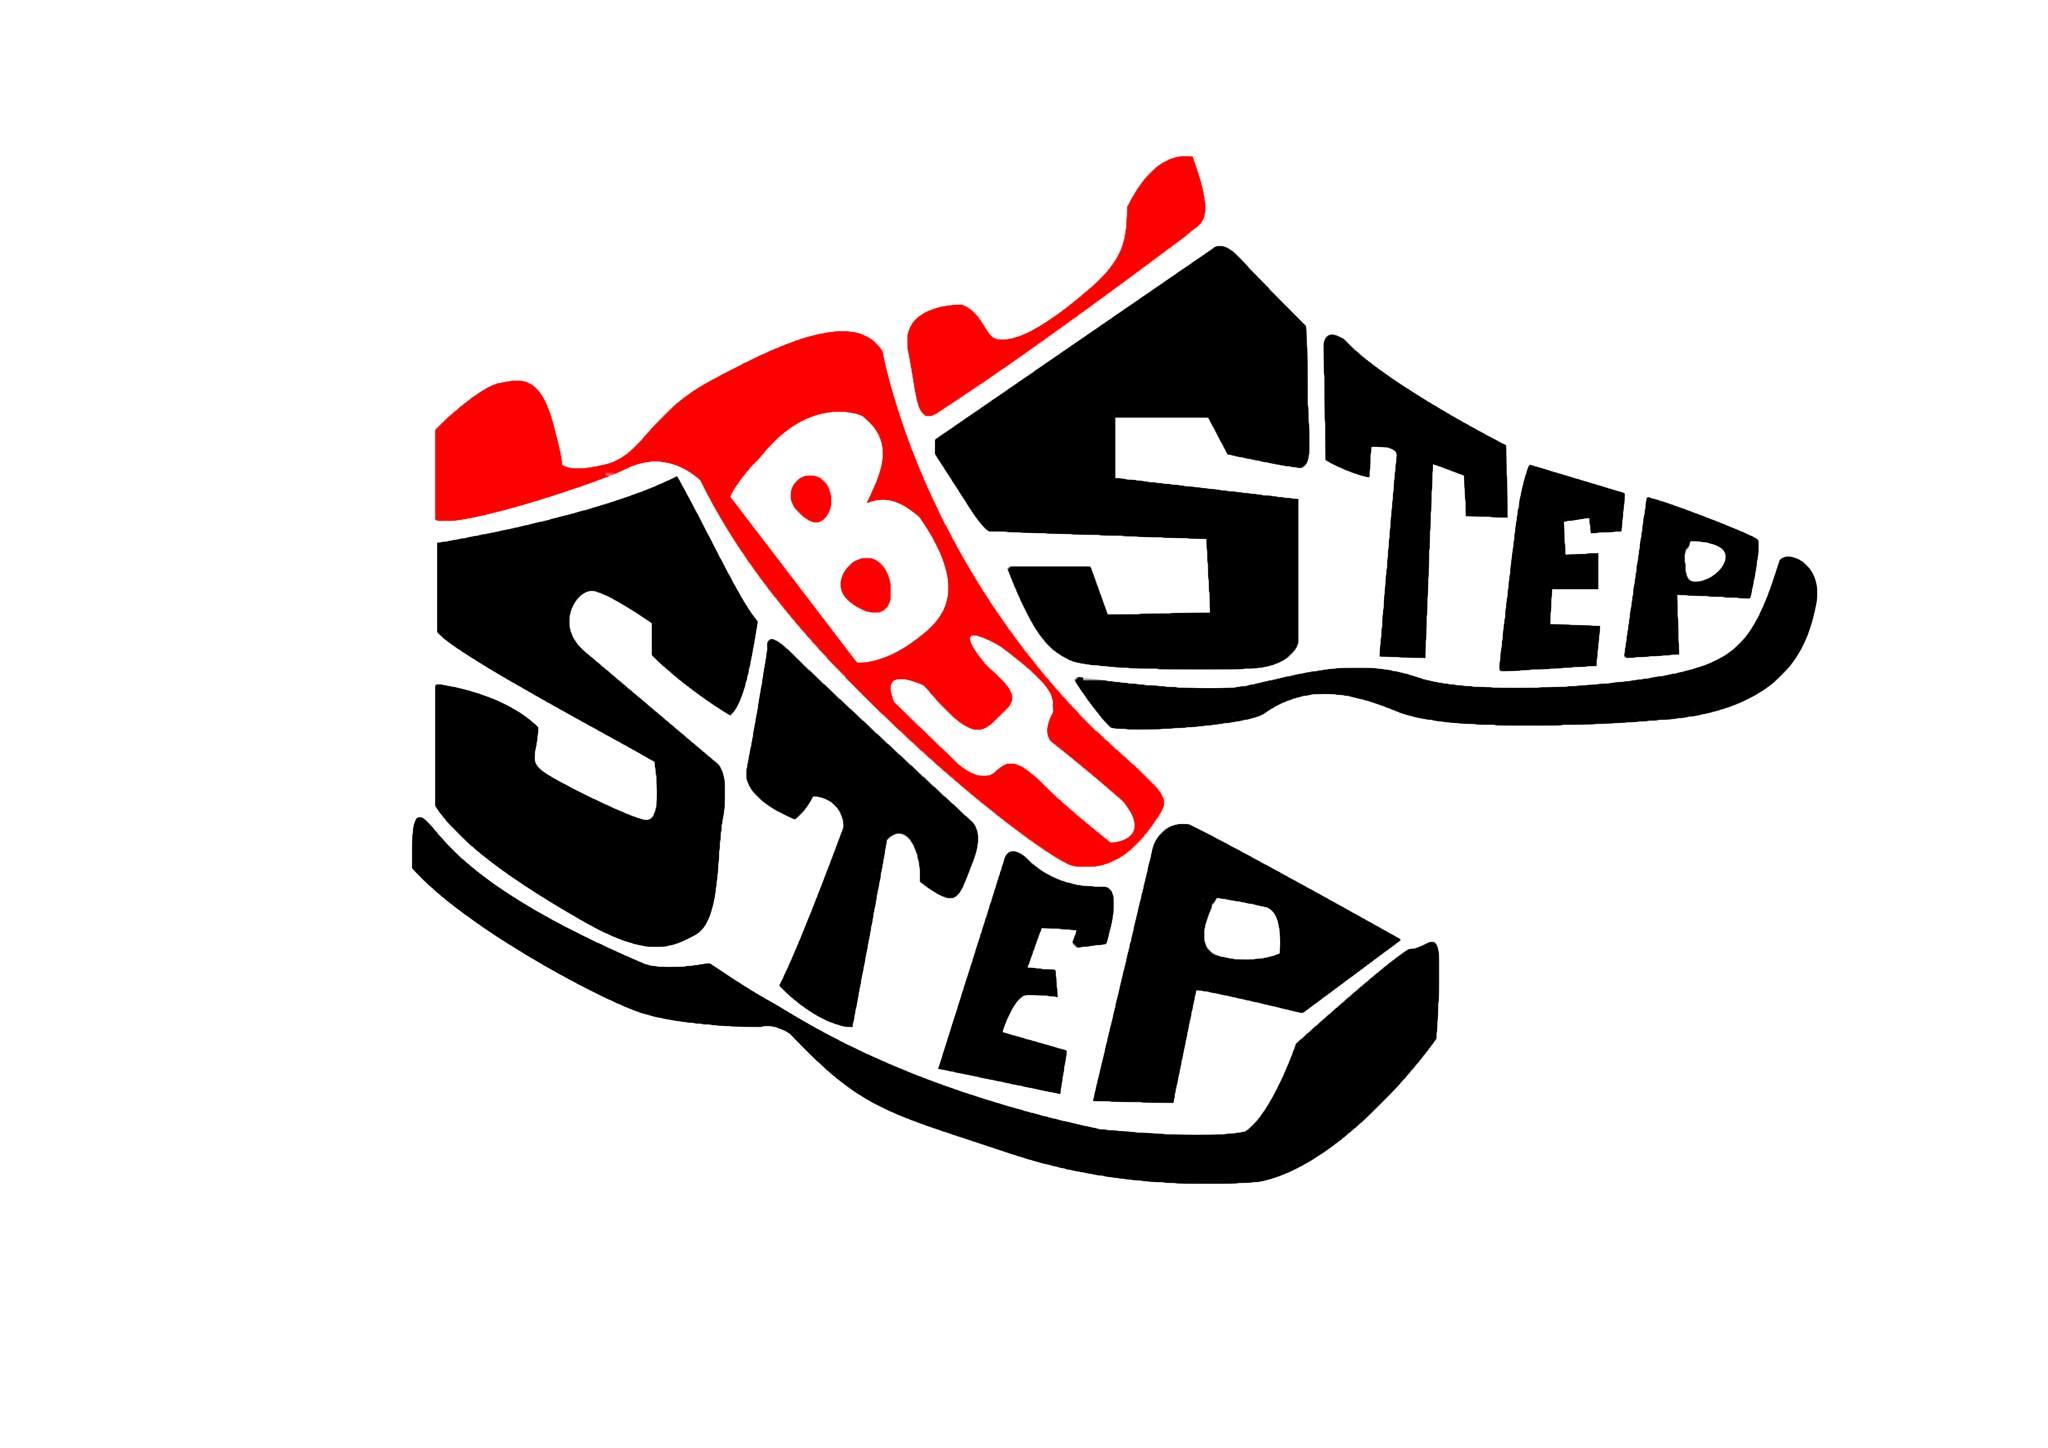 stepbystepsneakers